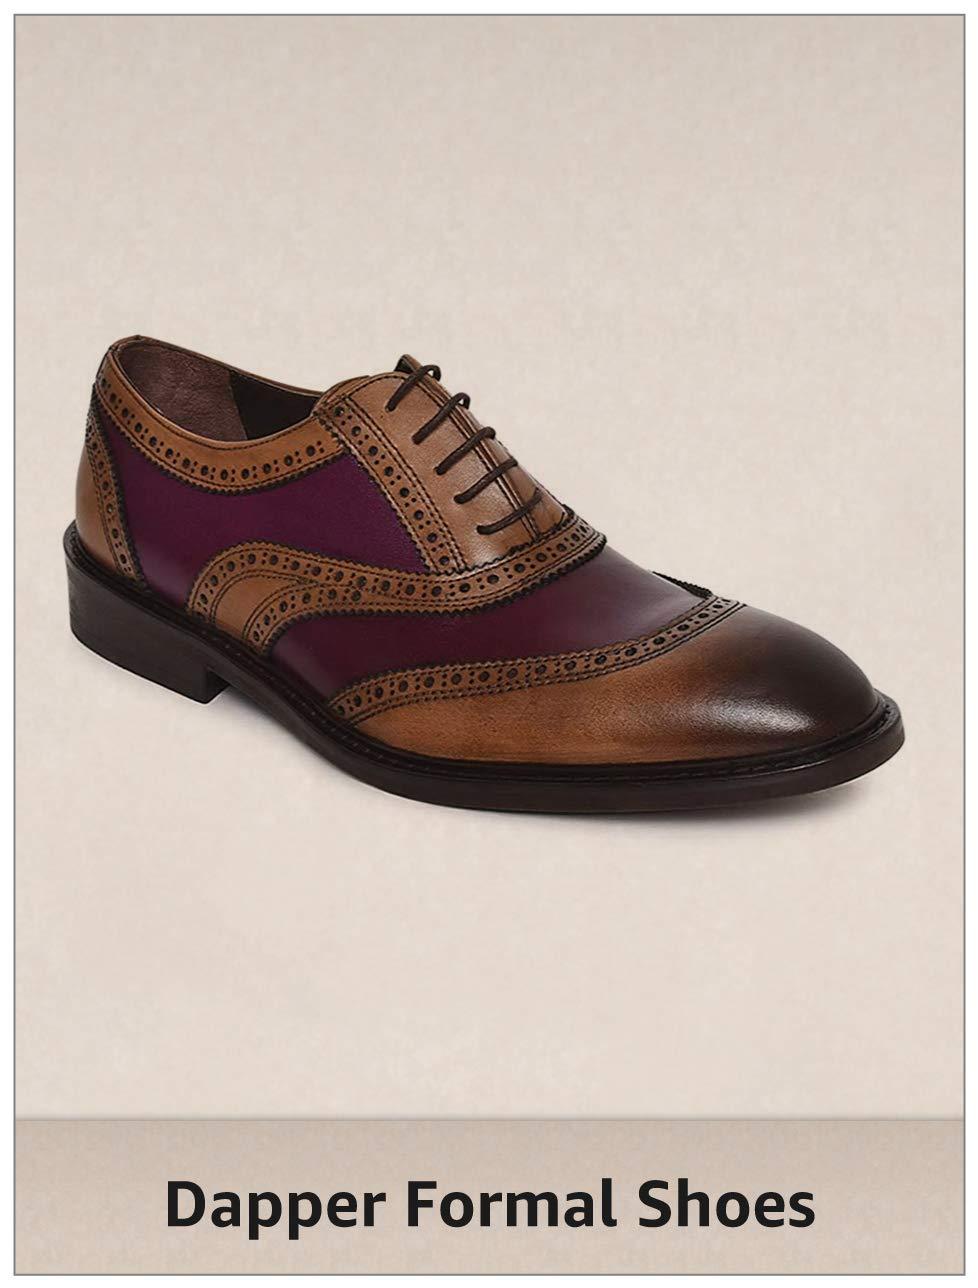 Dapper Formal Shoes